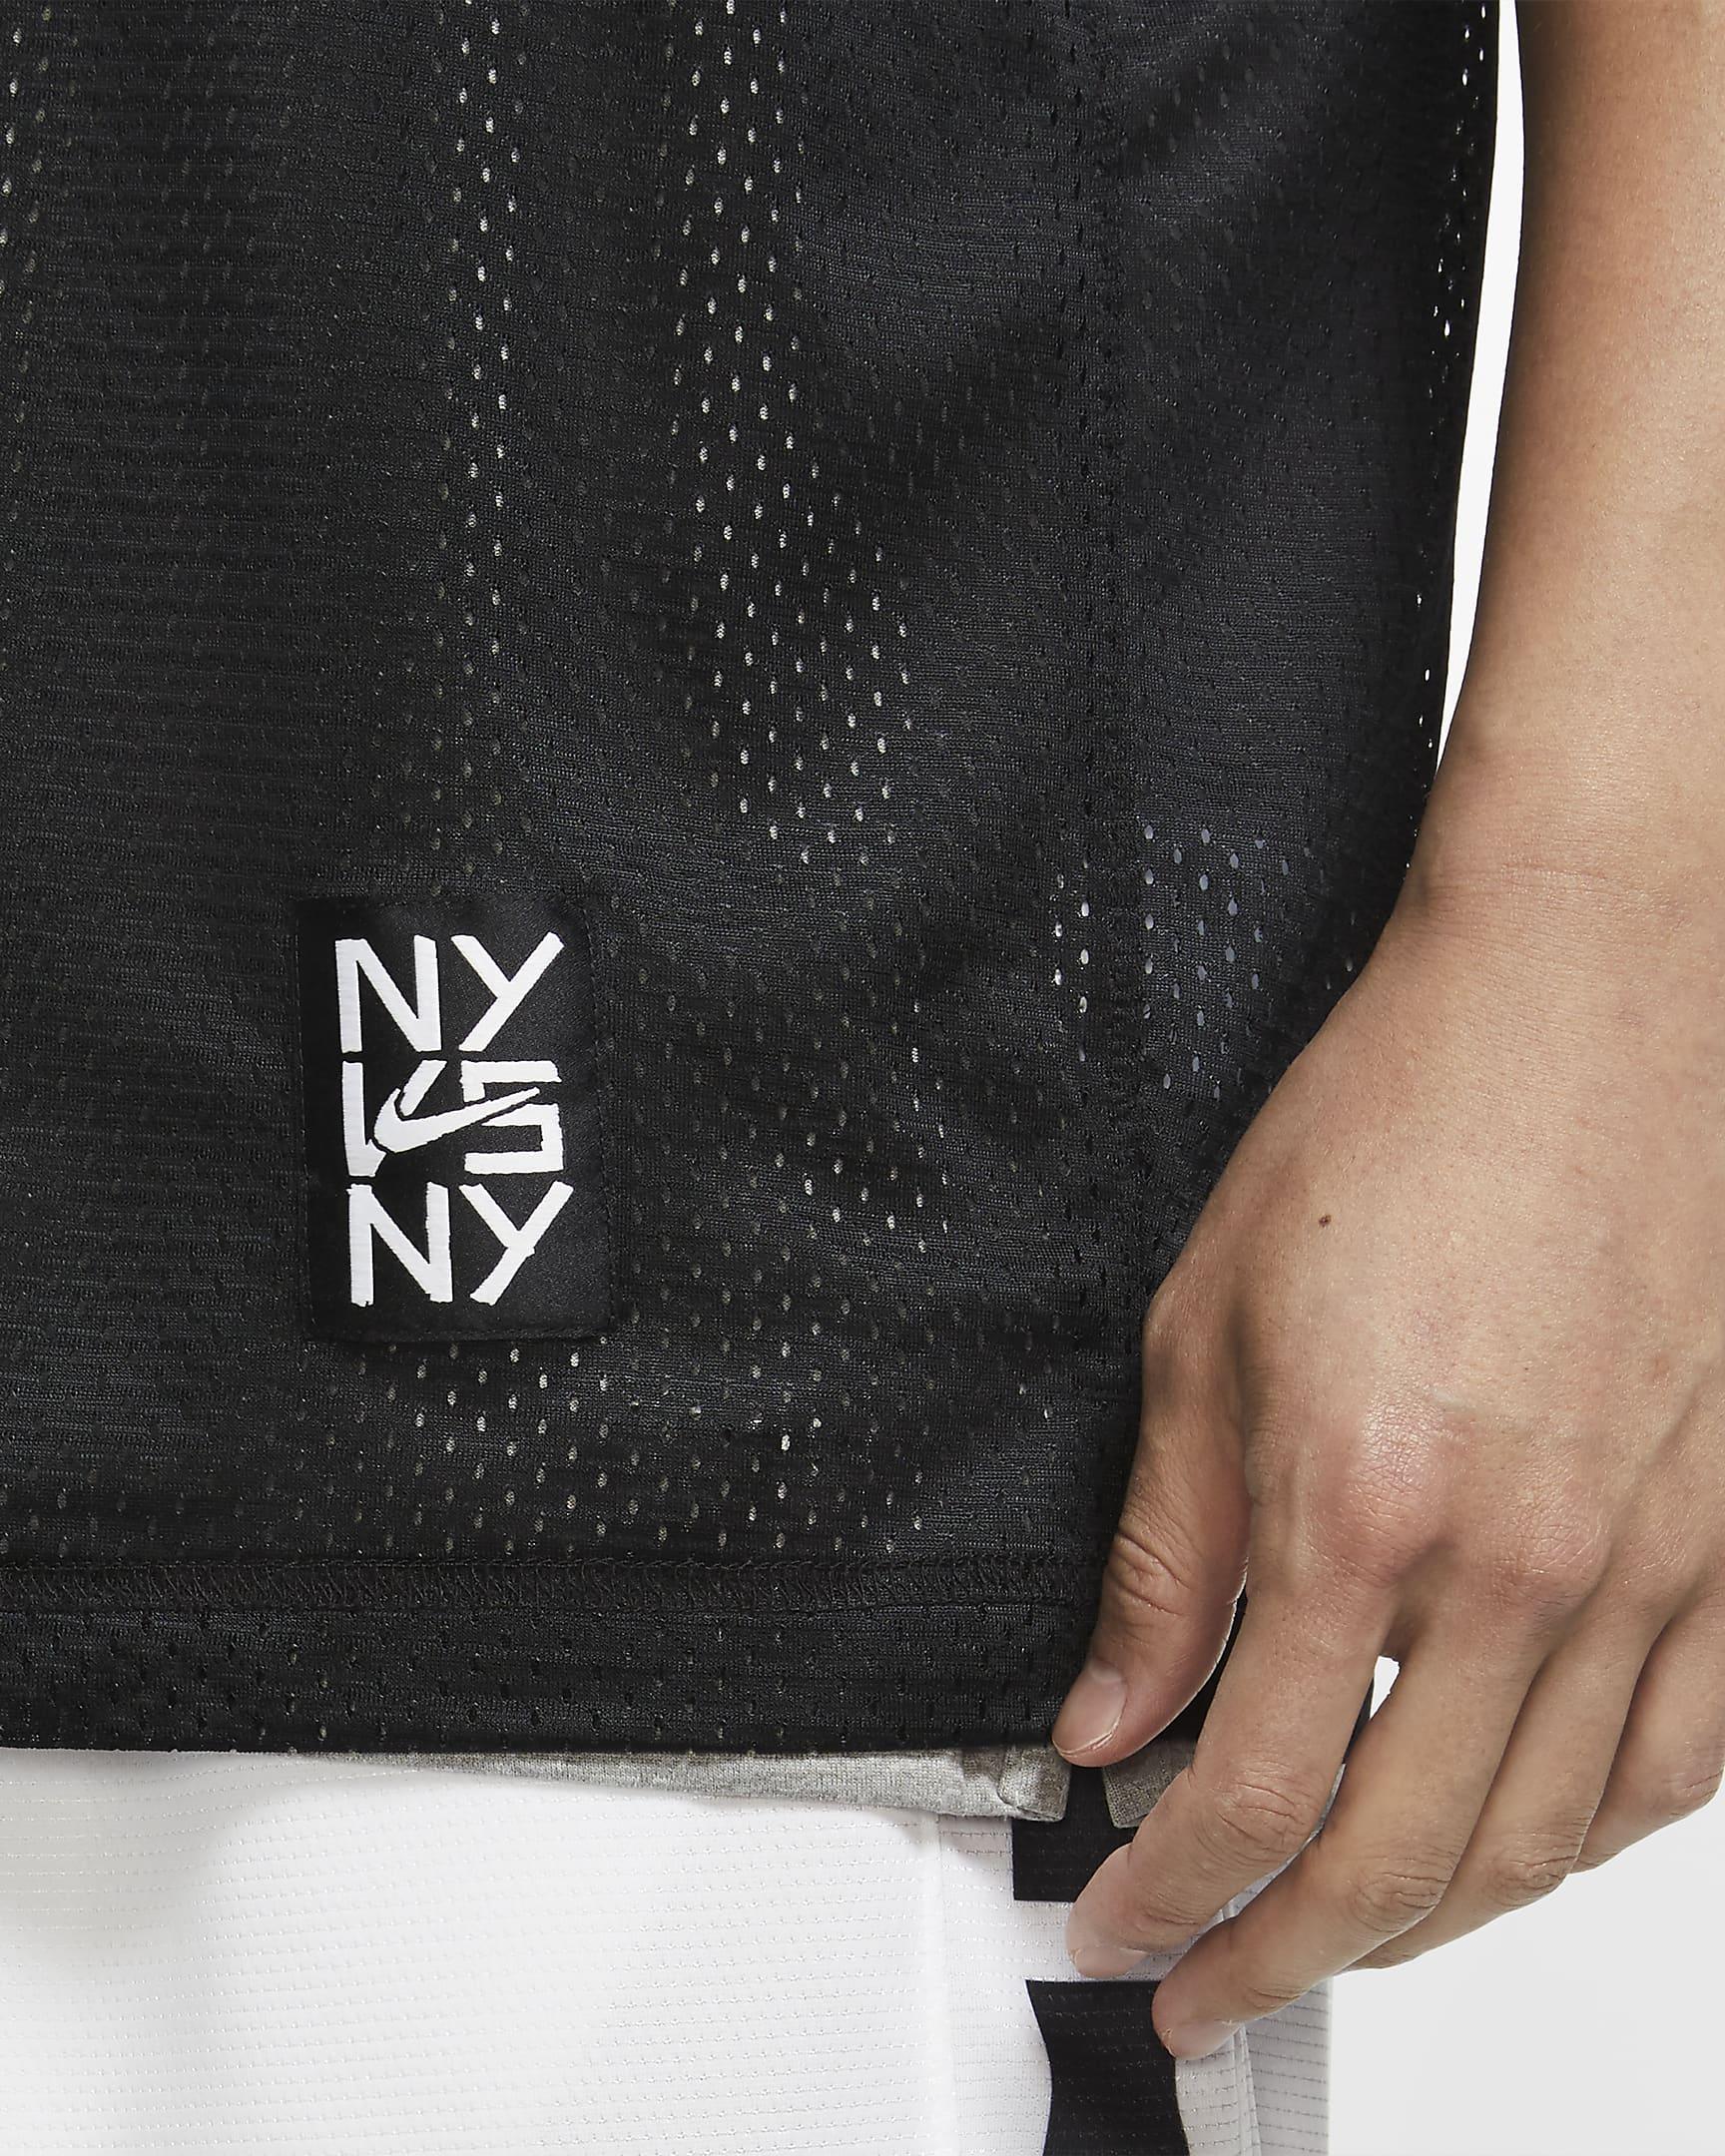 standard-issue-ny-vs-ny-mens-basketball-reversible-mesh-jersey-hbQngw-2.png